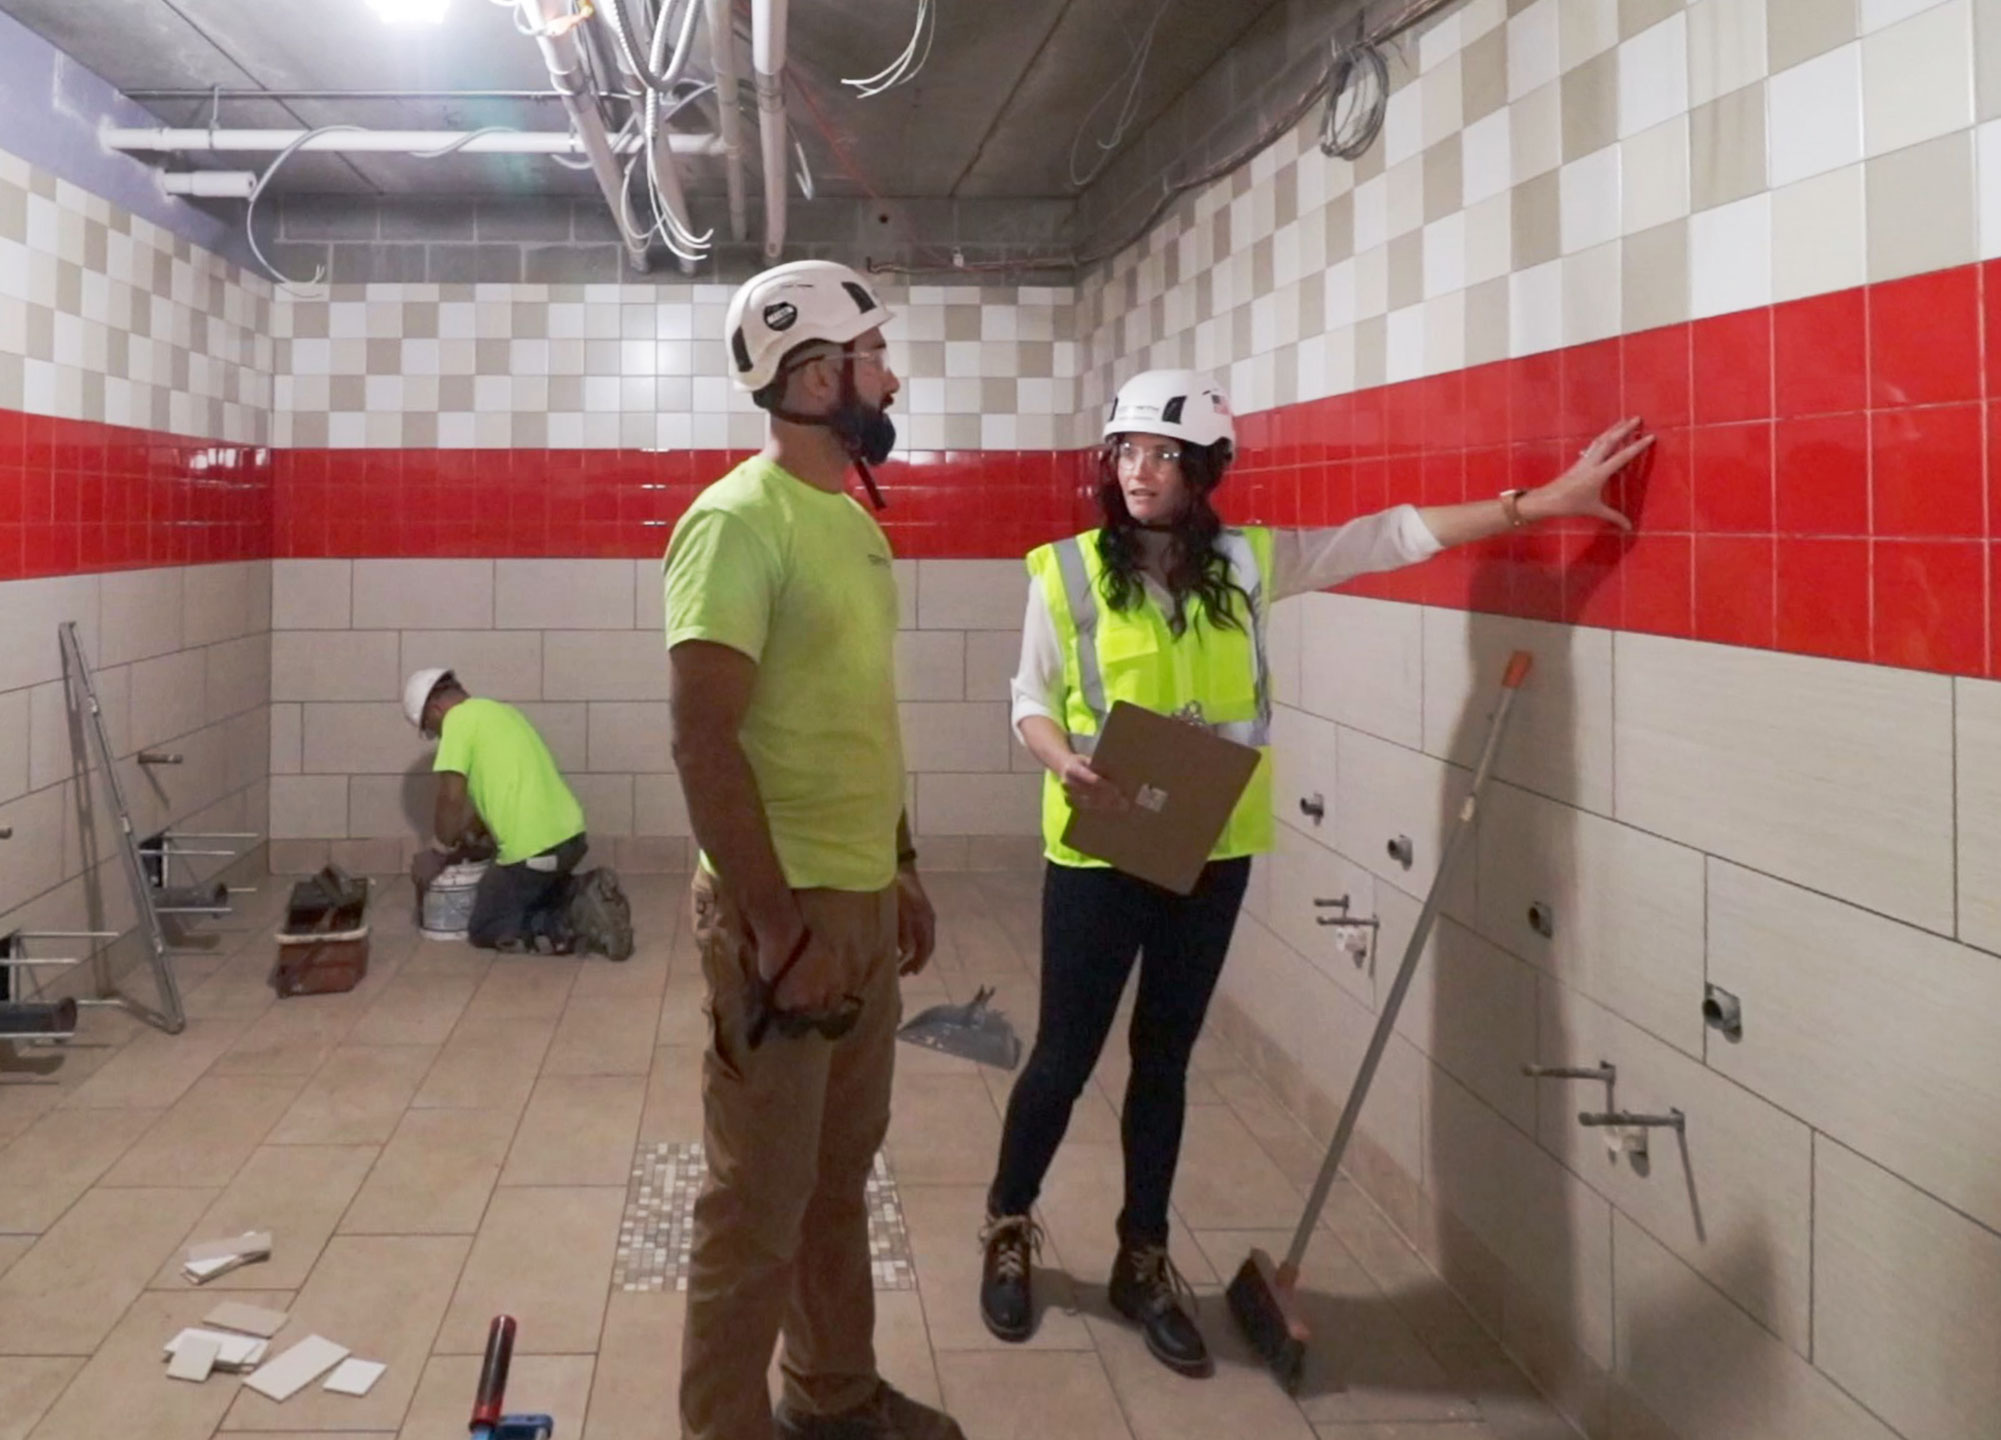 C.D. Smith Construction Director of Educational Markets Tricia Muellenbach on School Building Site Bathroom Construction